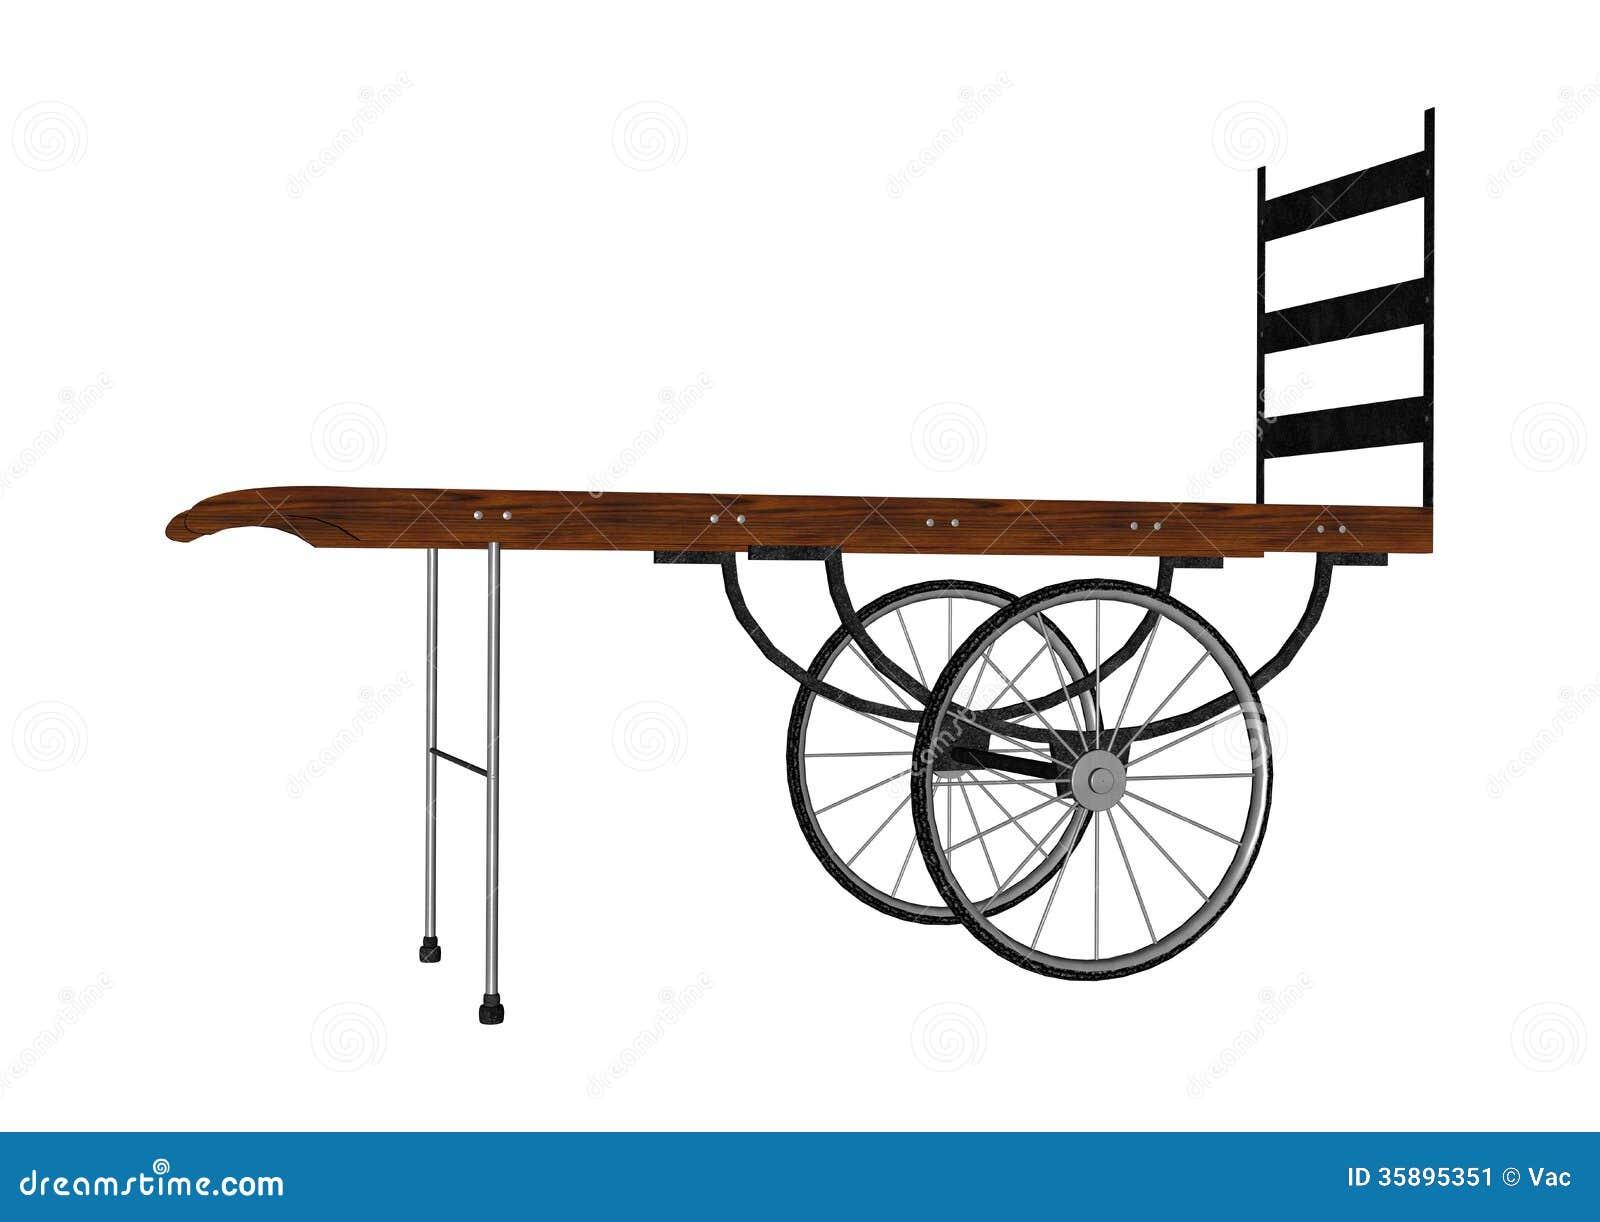 Vintage Luggage Hand Cart Stock Image - Image: 35895351